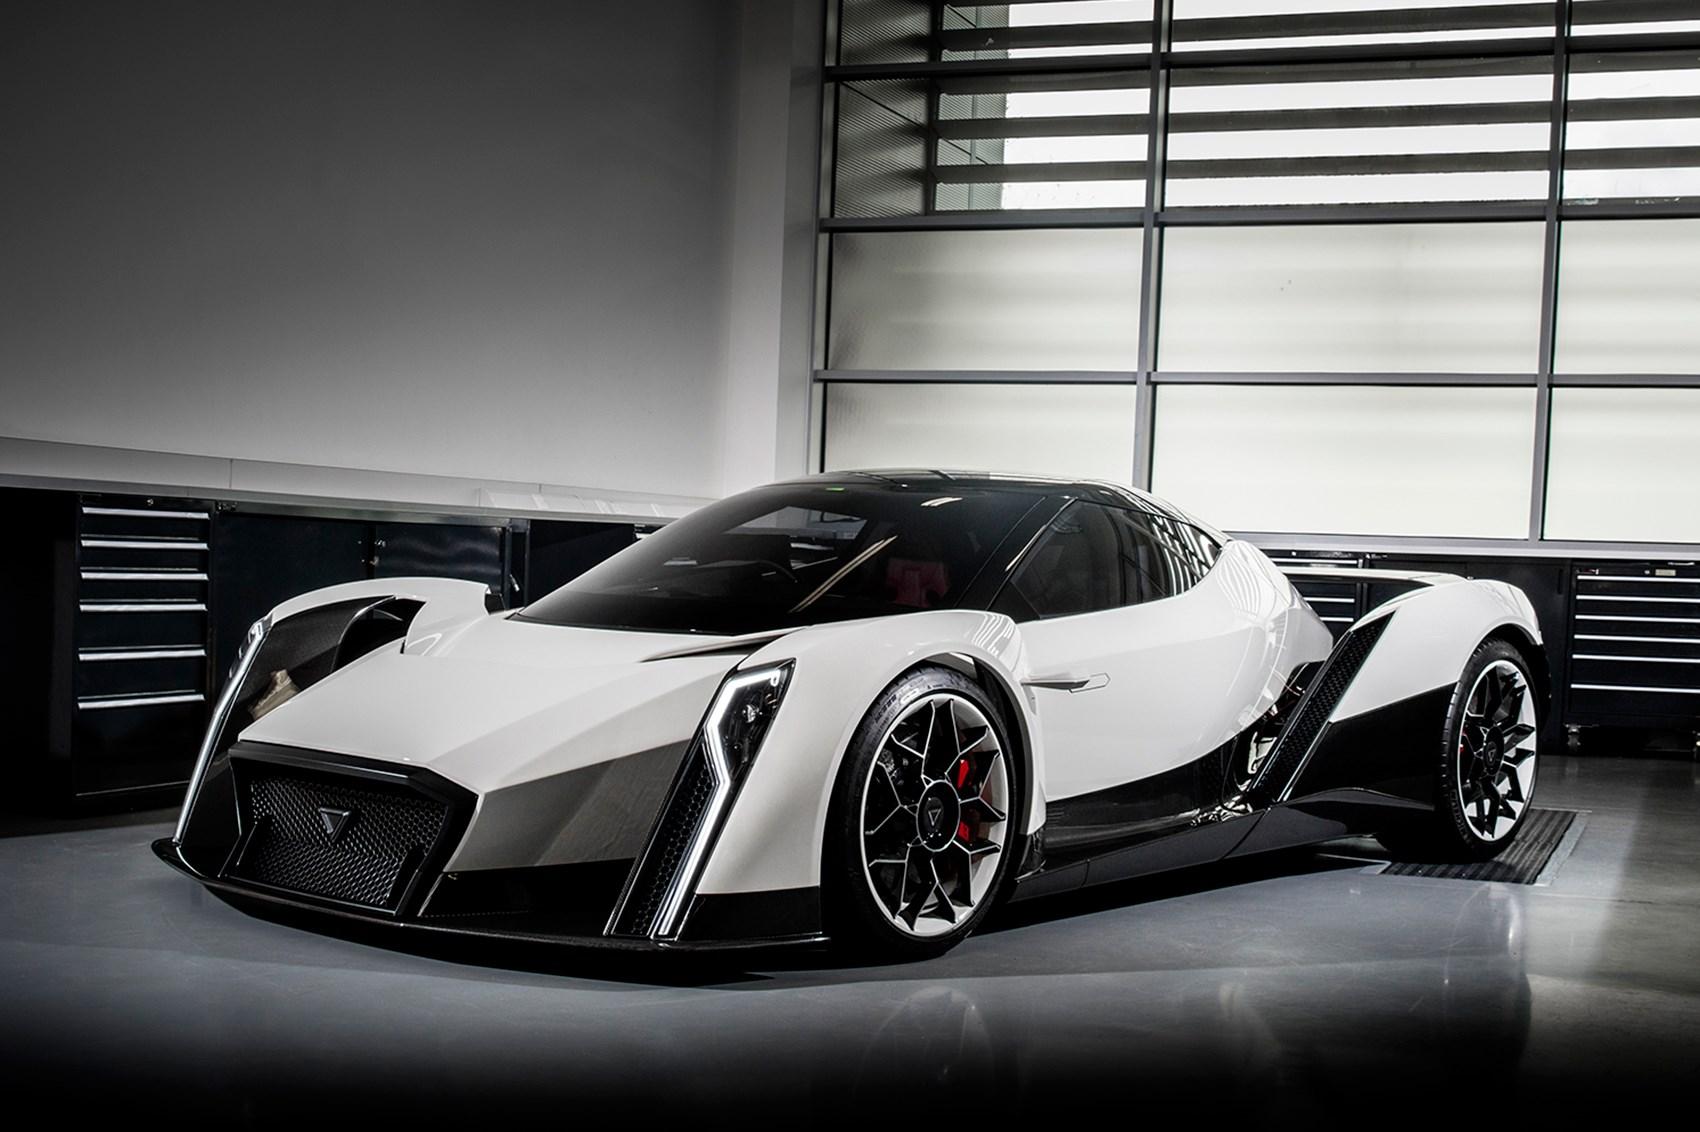 electric supercar - anda Dendrobium